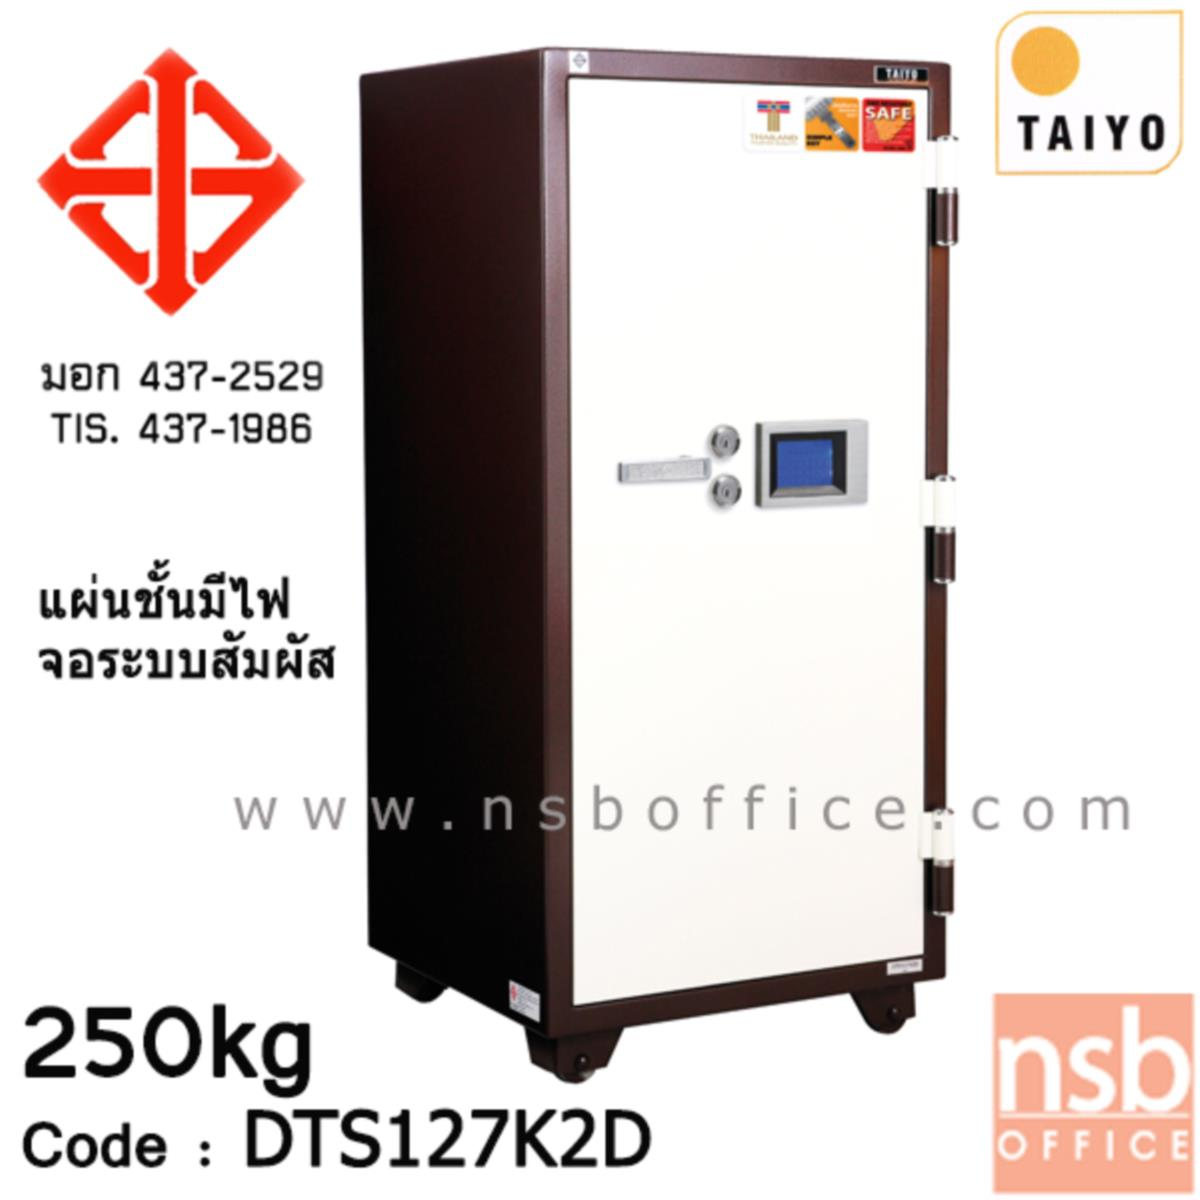 F01A061:ตู้เซฟ Taiyo ระบบดิจิตอล จอสัมผัส รุ่น 250 กก. 2 กุญแจ 1 รหัส (DTS 127 K2D)